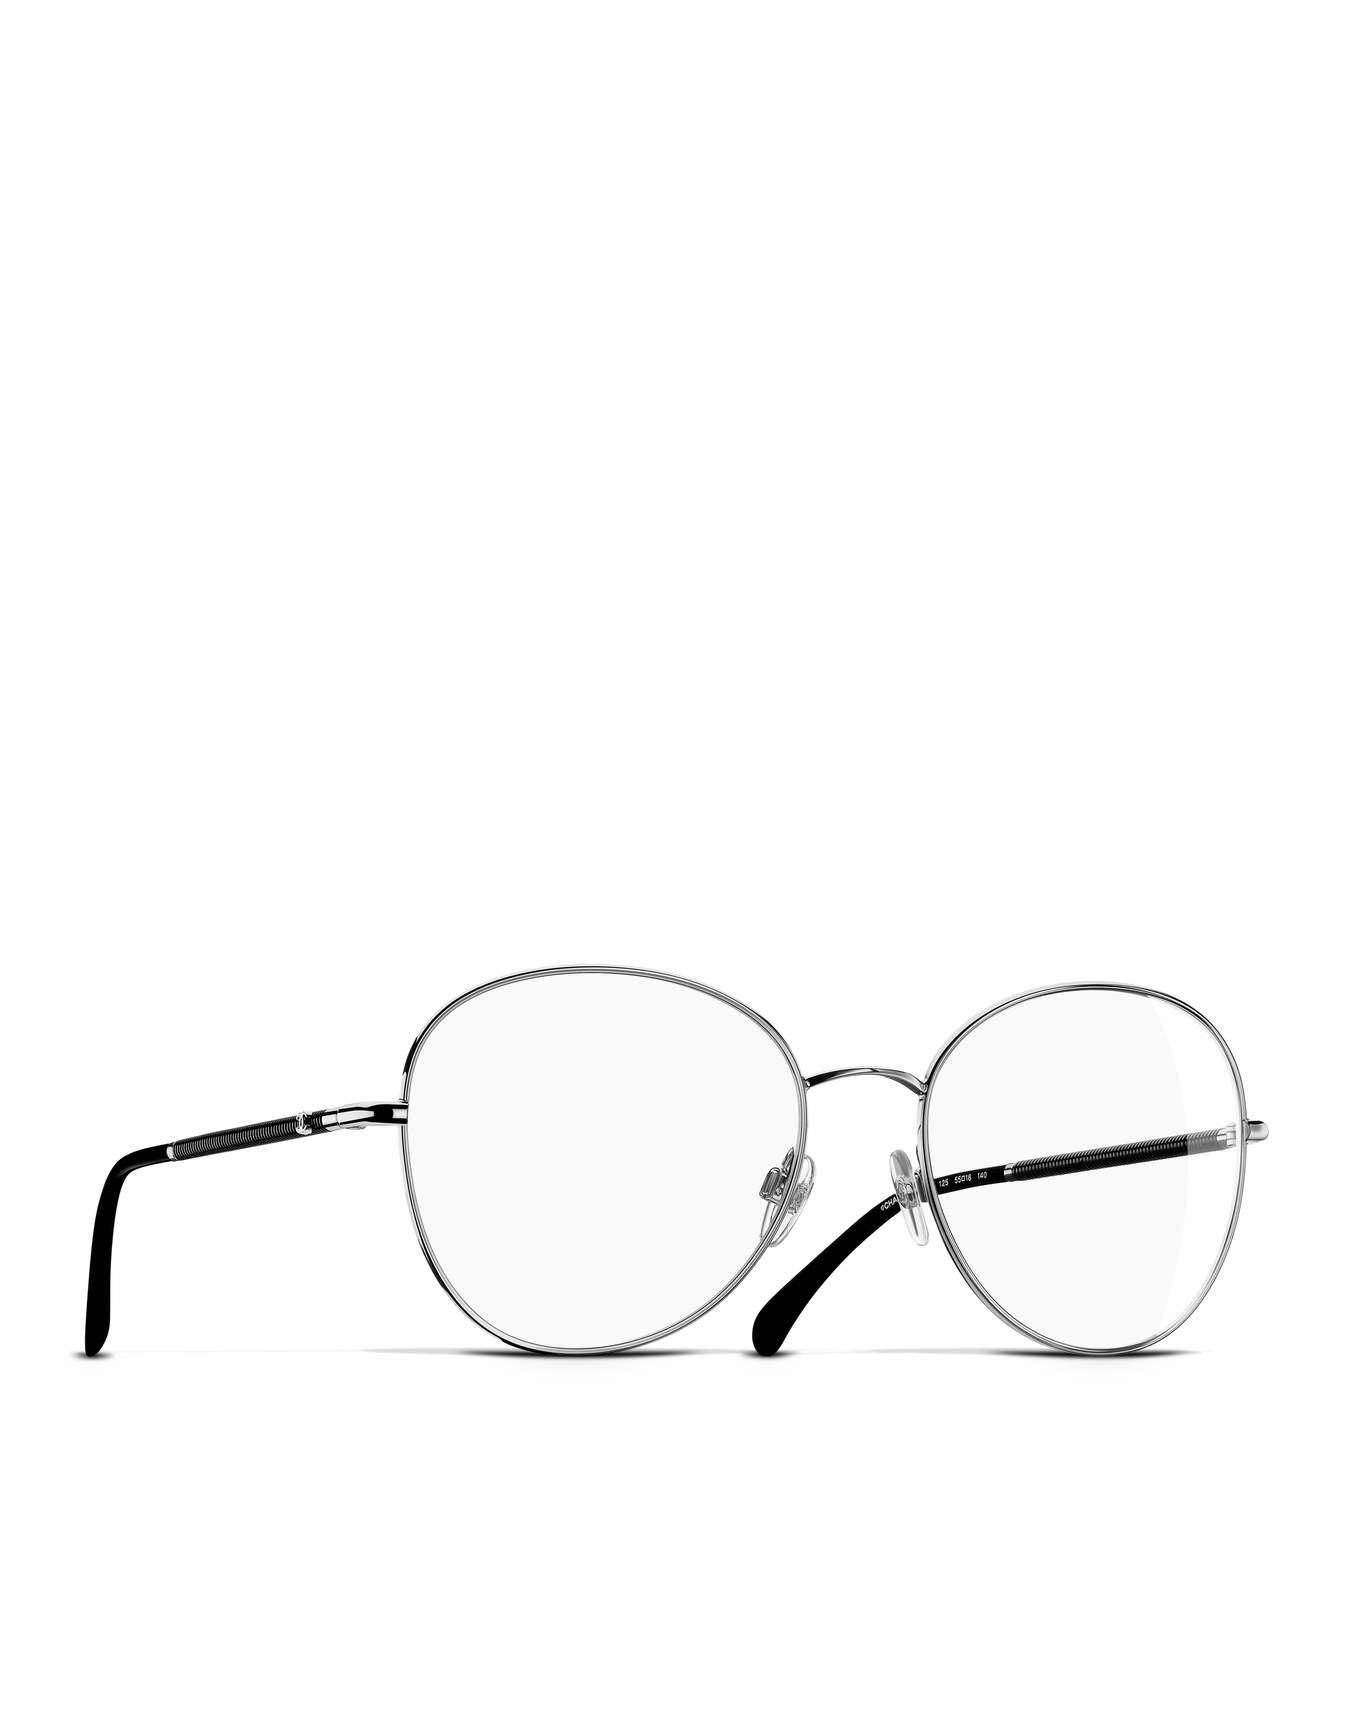 1354x1728 Round Eyeglasses, Metal Silver